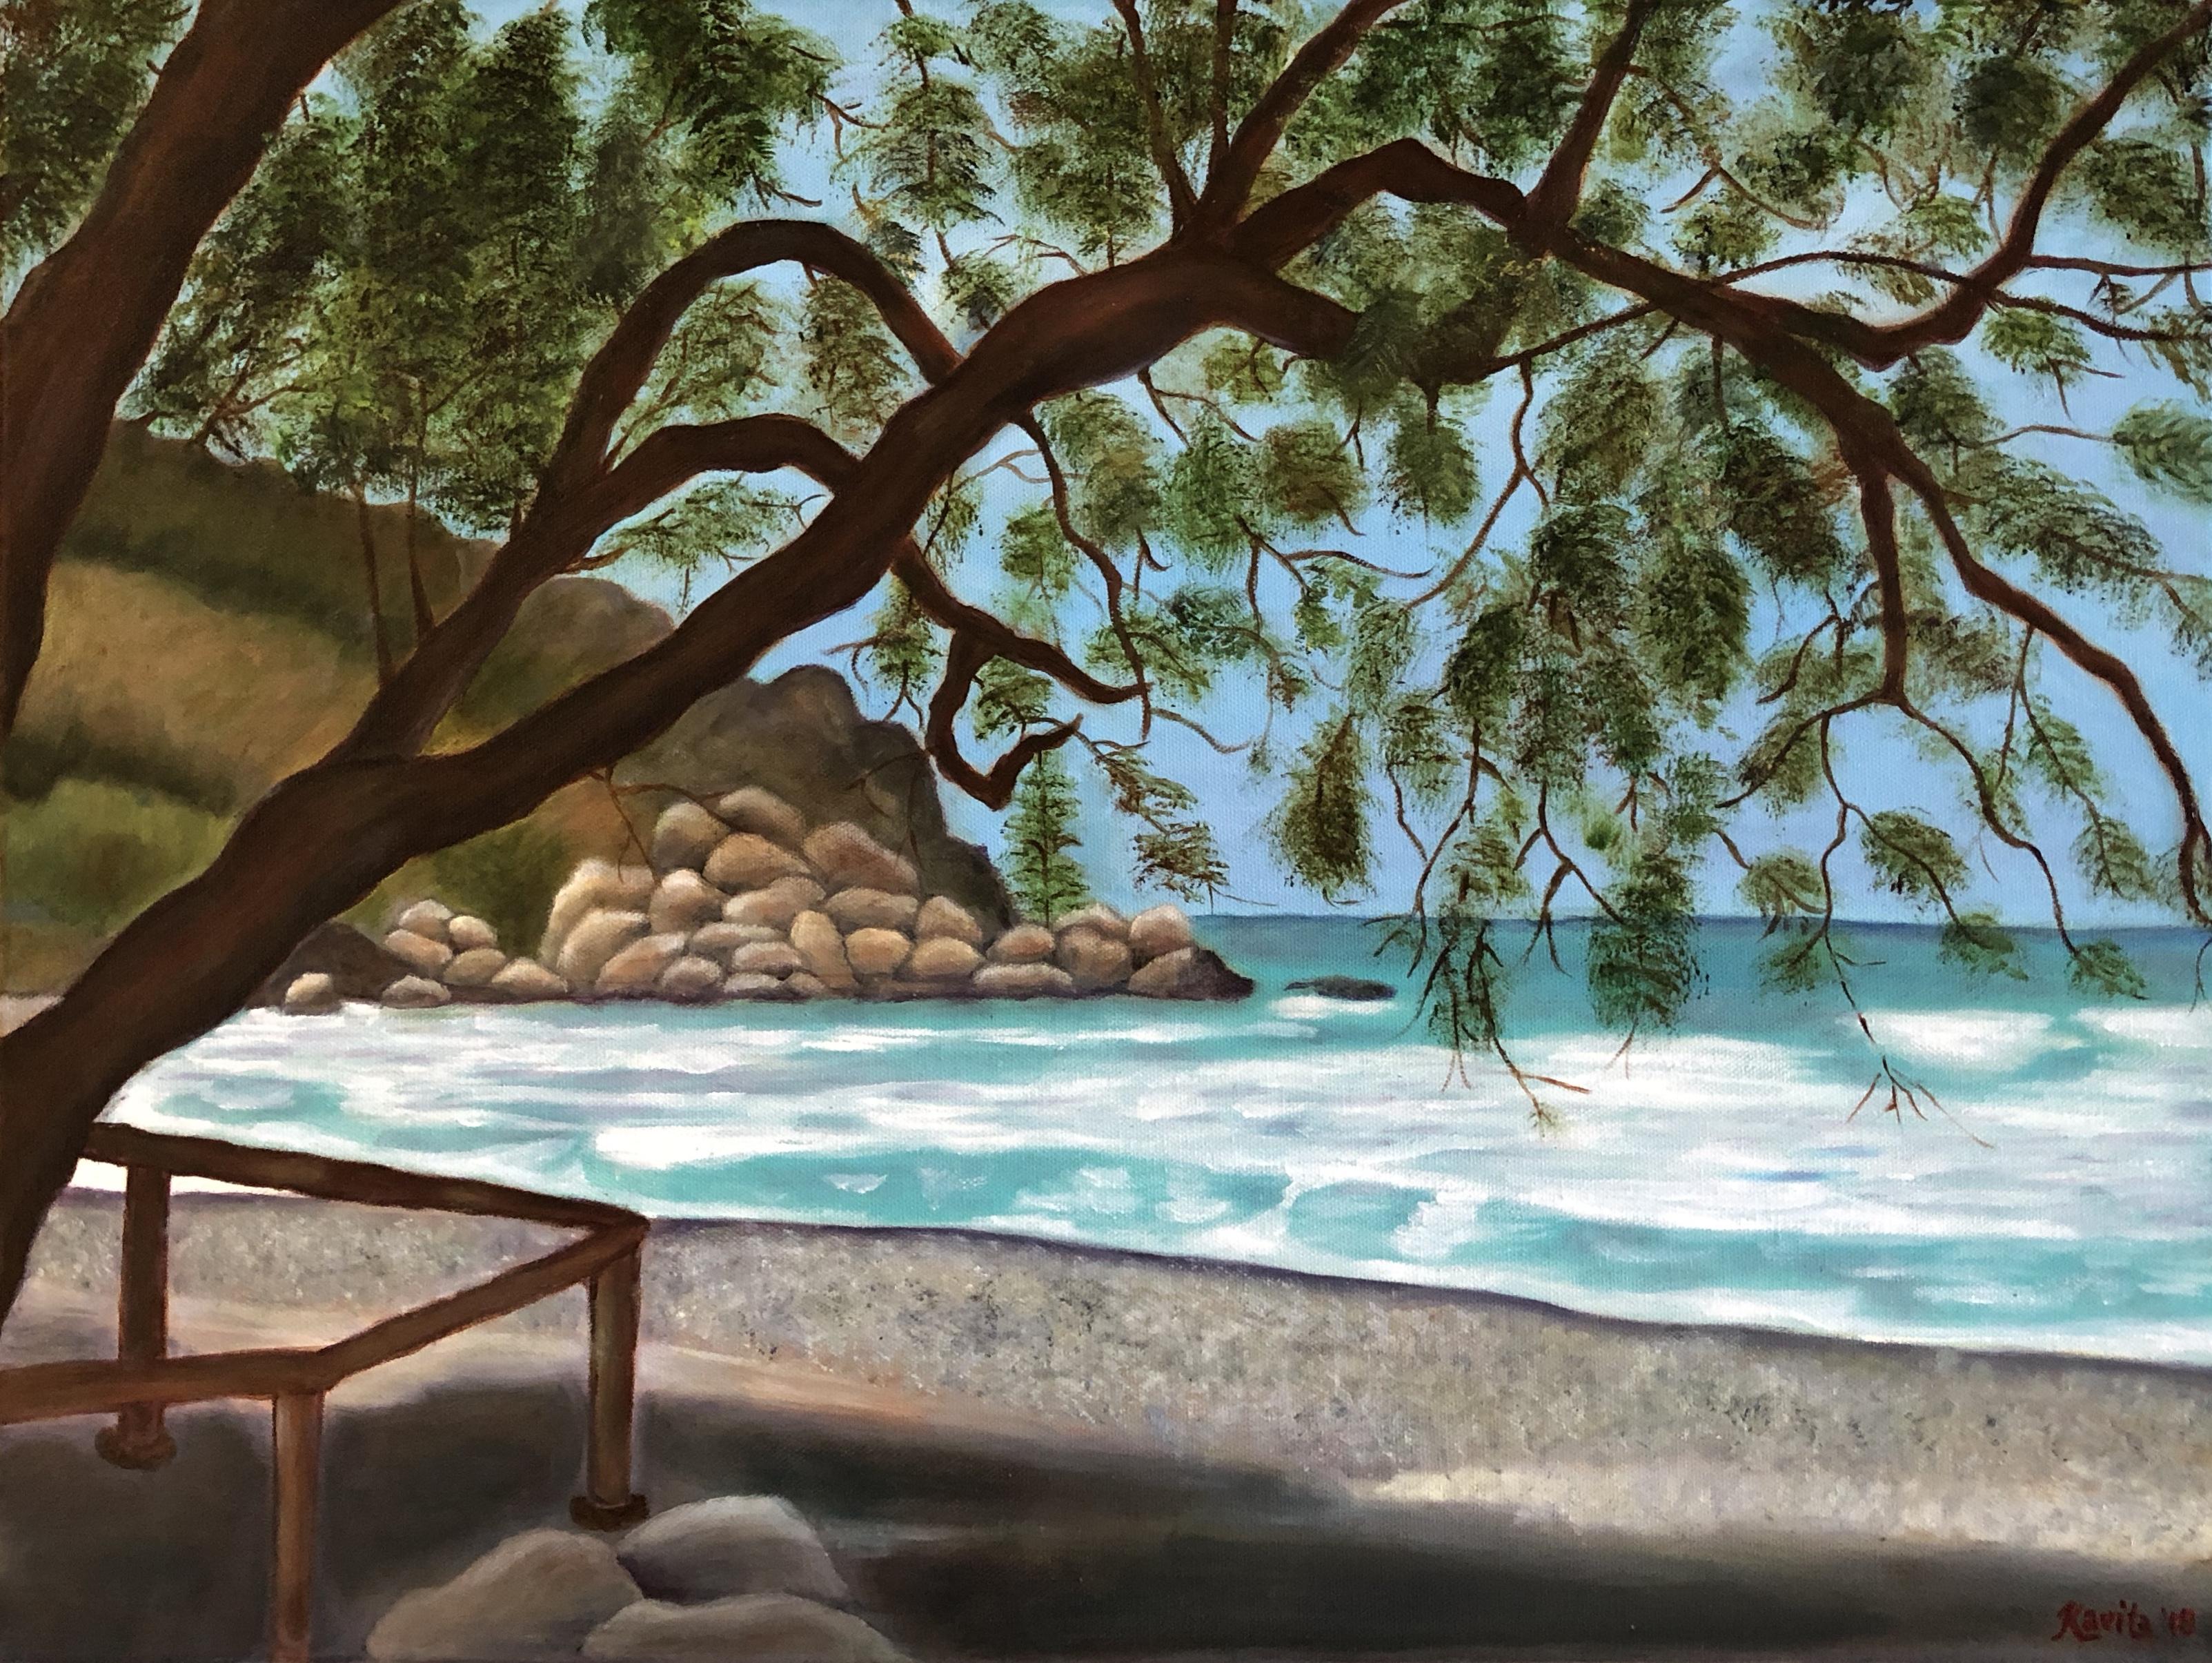 """Tranquil Waters"" - Sfinari, Crete"